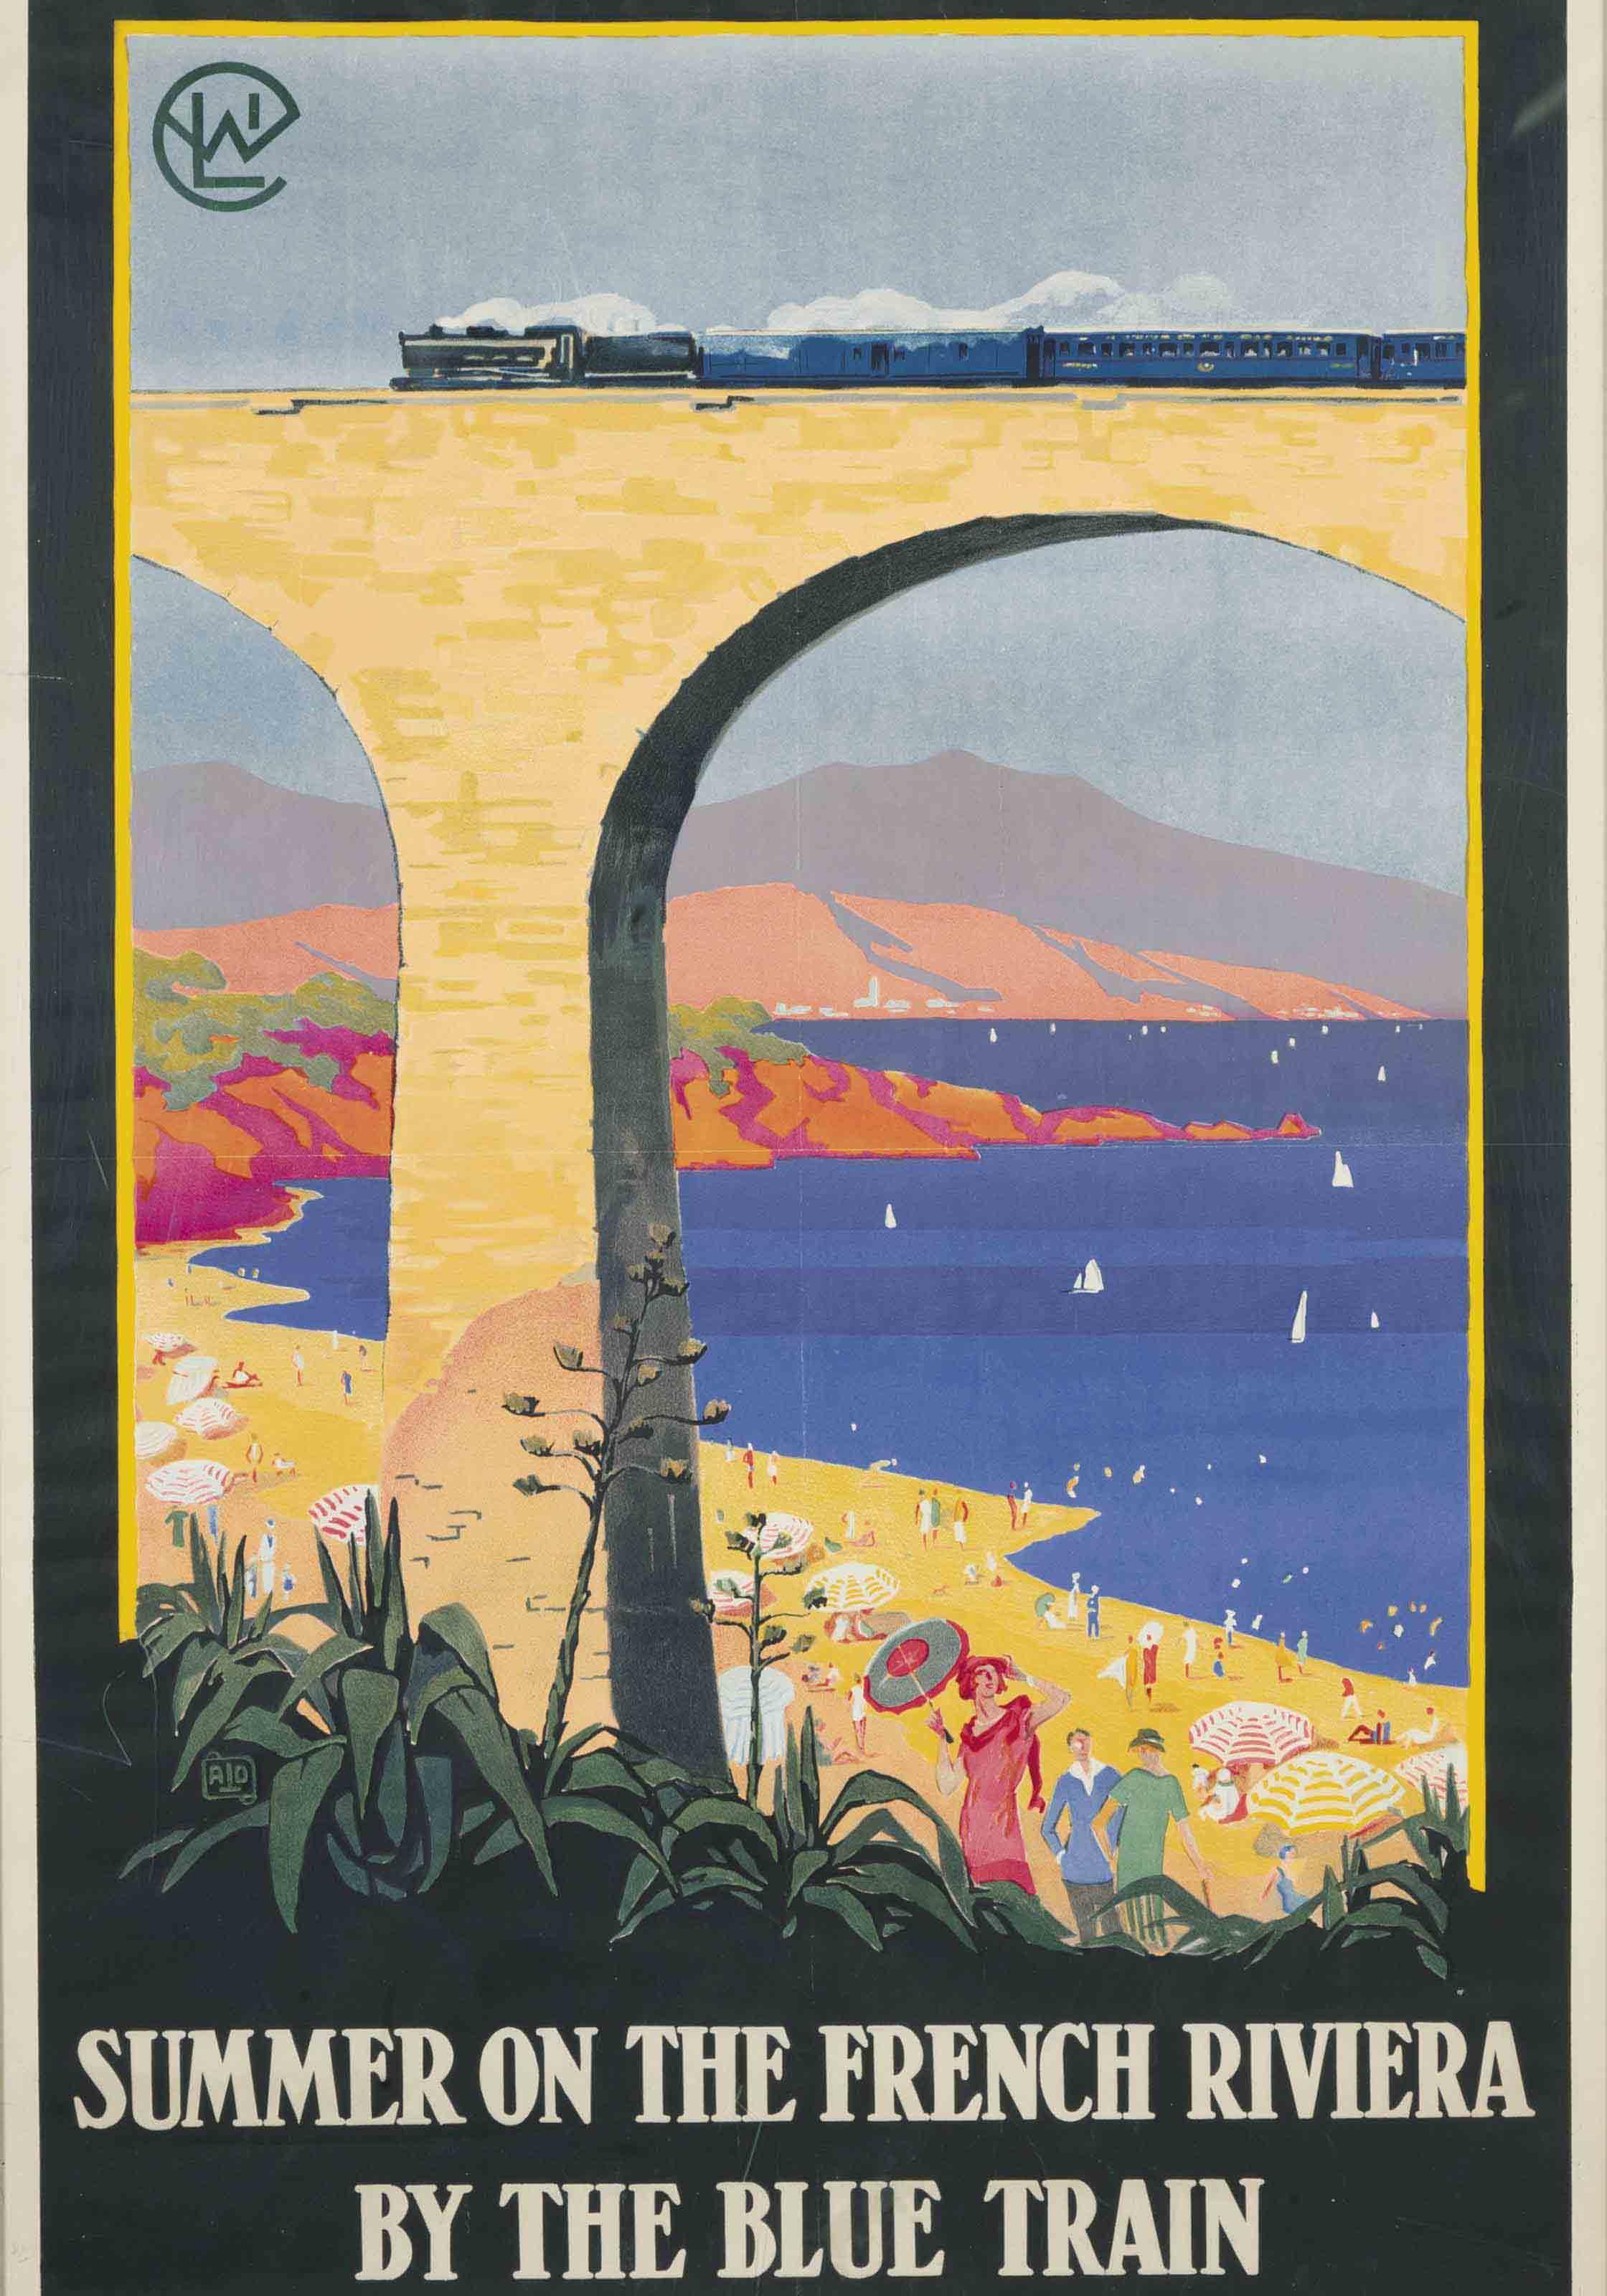 ALO (CHARLES HALLO, 1884-1969)